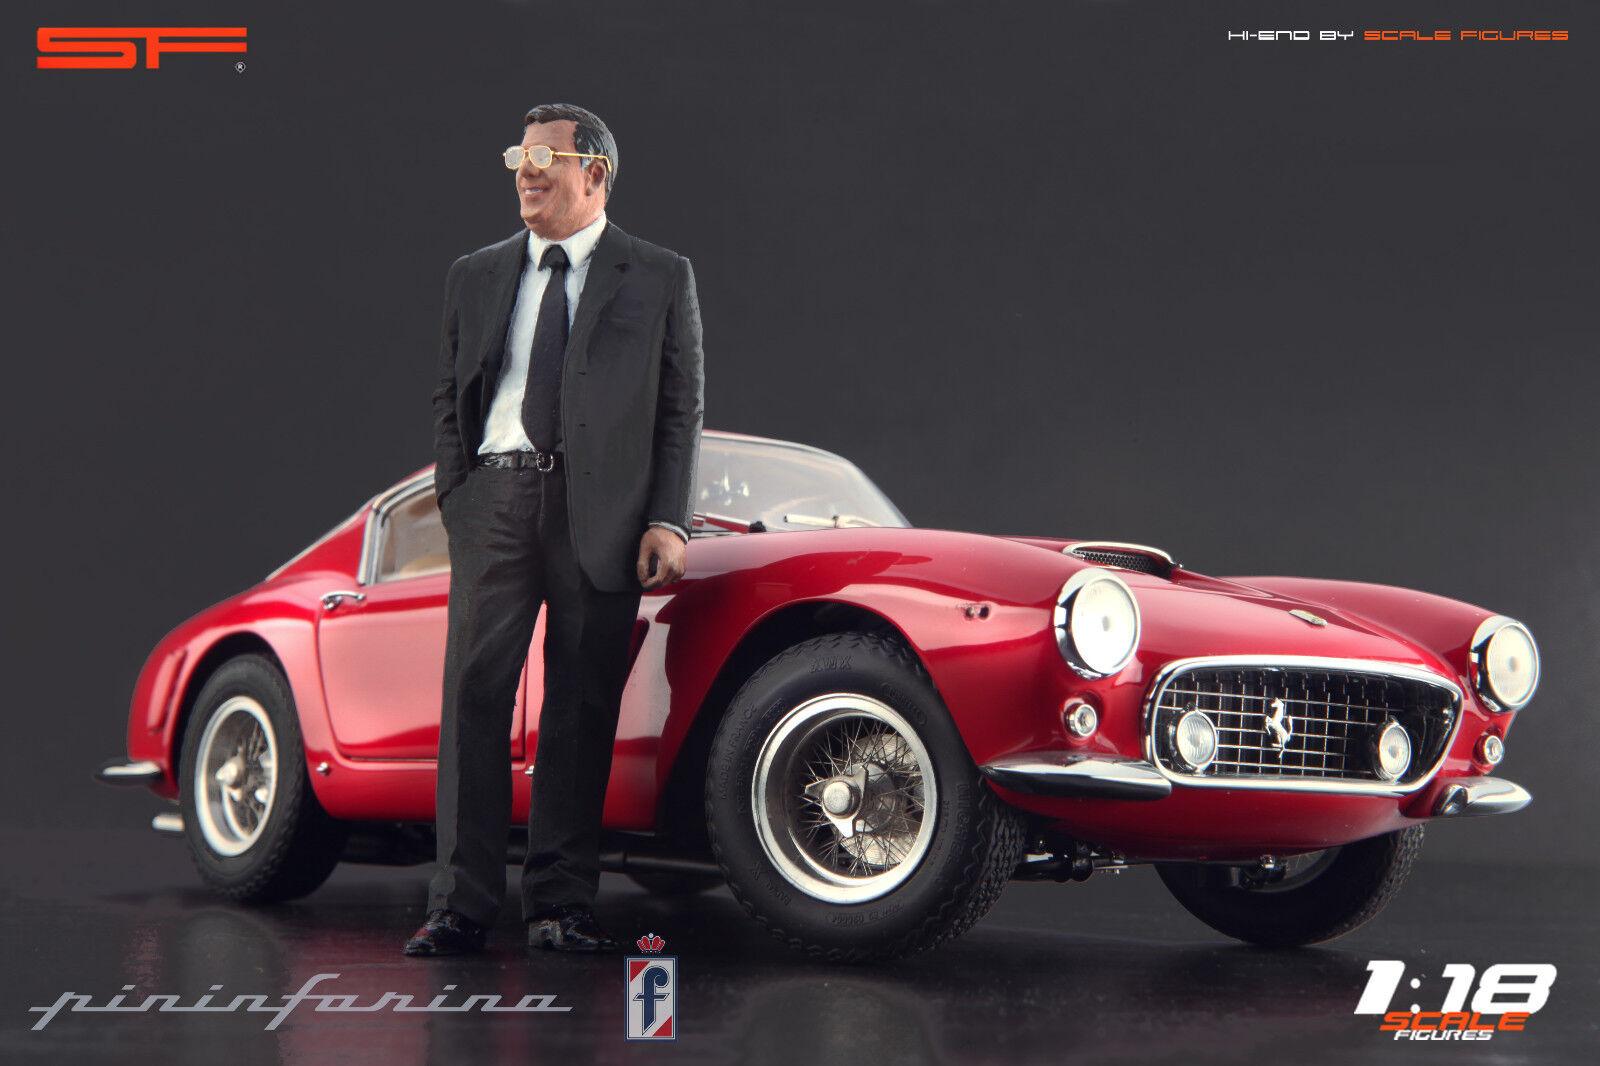 1 18 Sergio Pininfarina VERY RARE    figurine NO CARS    for diecast collectors